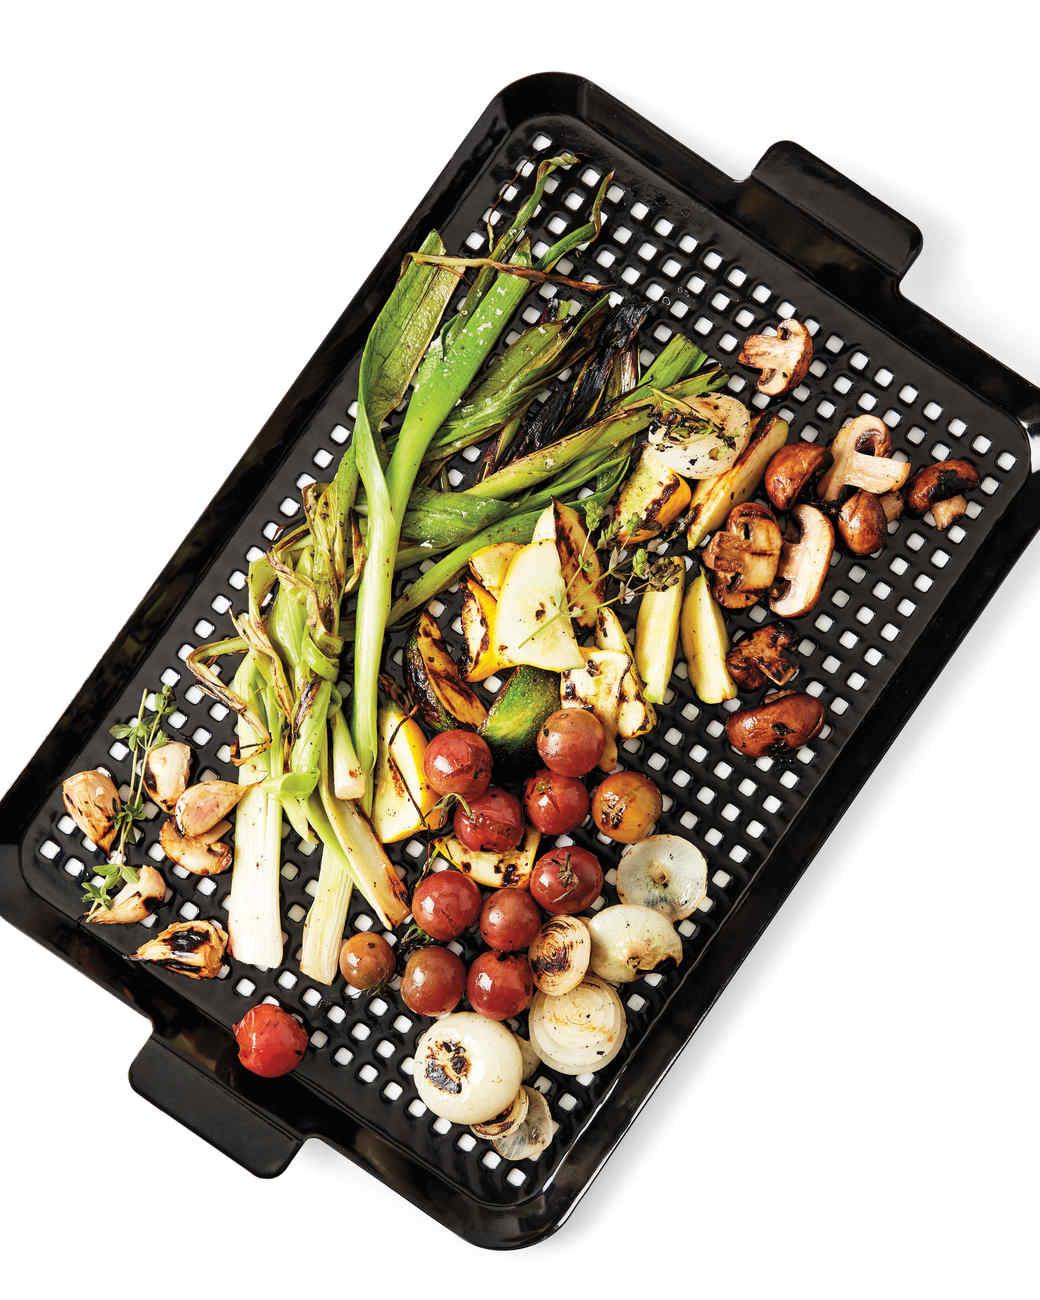 macy's grill topper